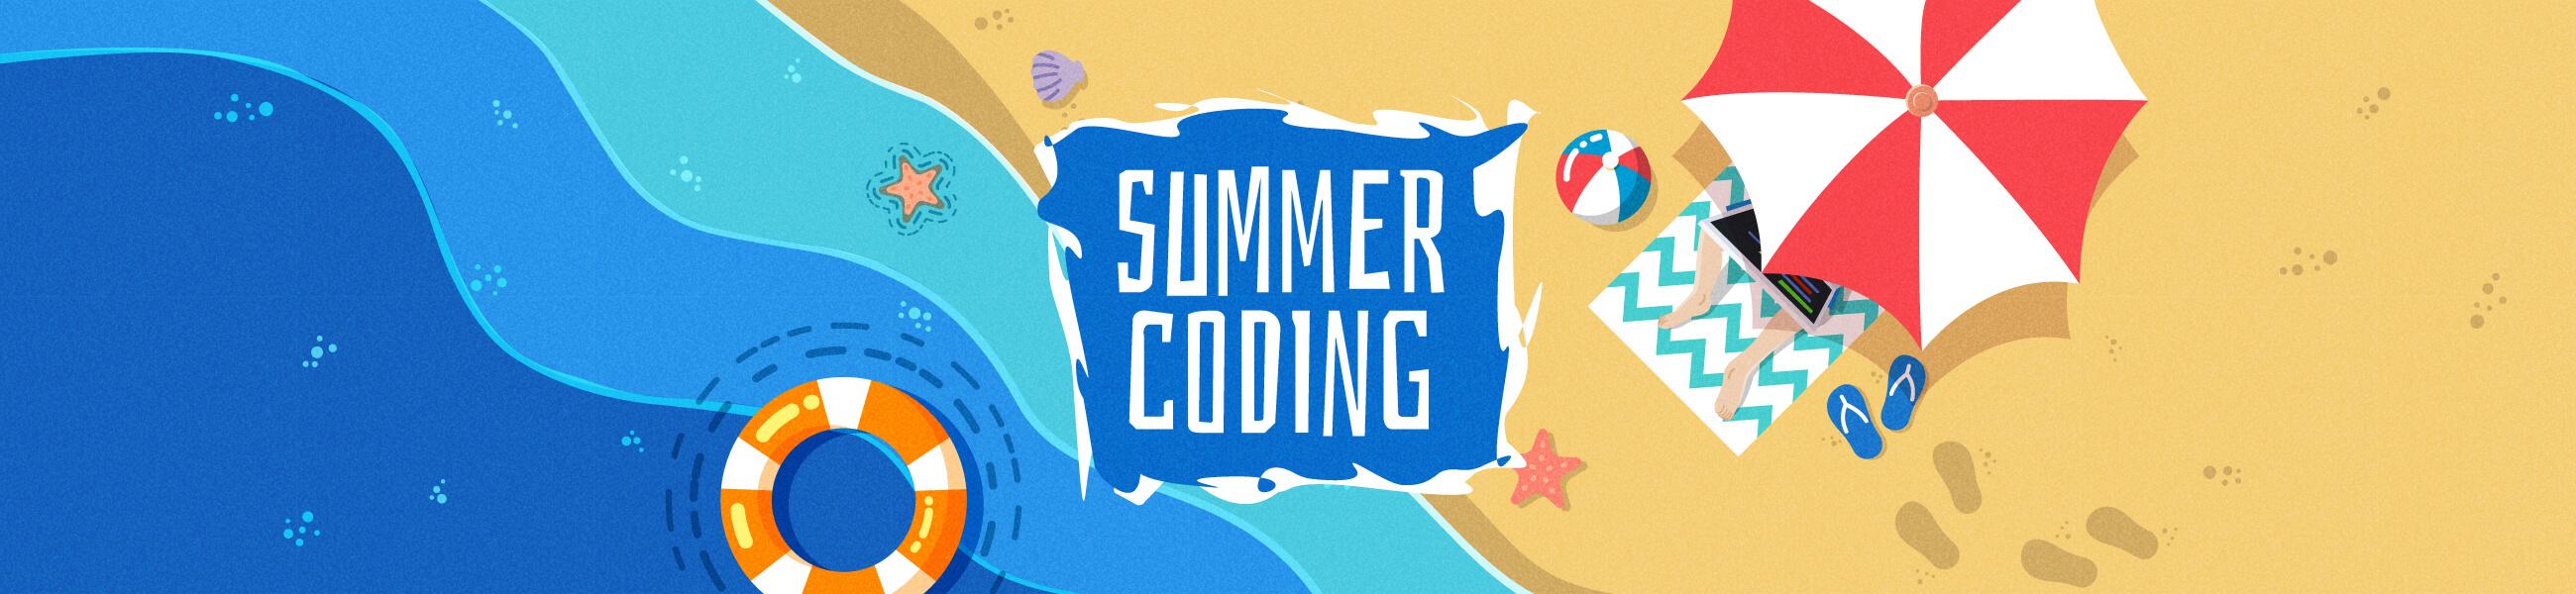 2019 Summer Coding - 여름방학 스타트업 인턴 프로그램의 이미지